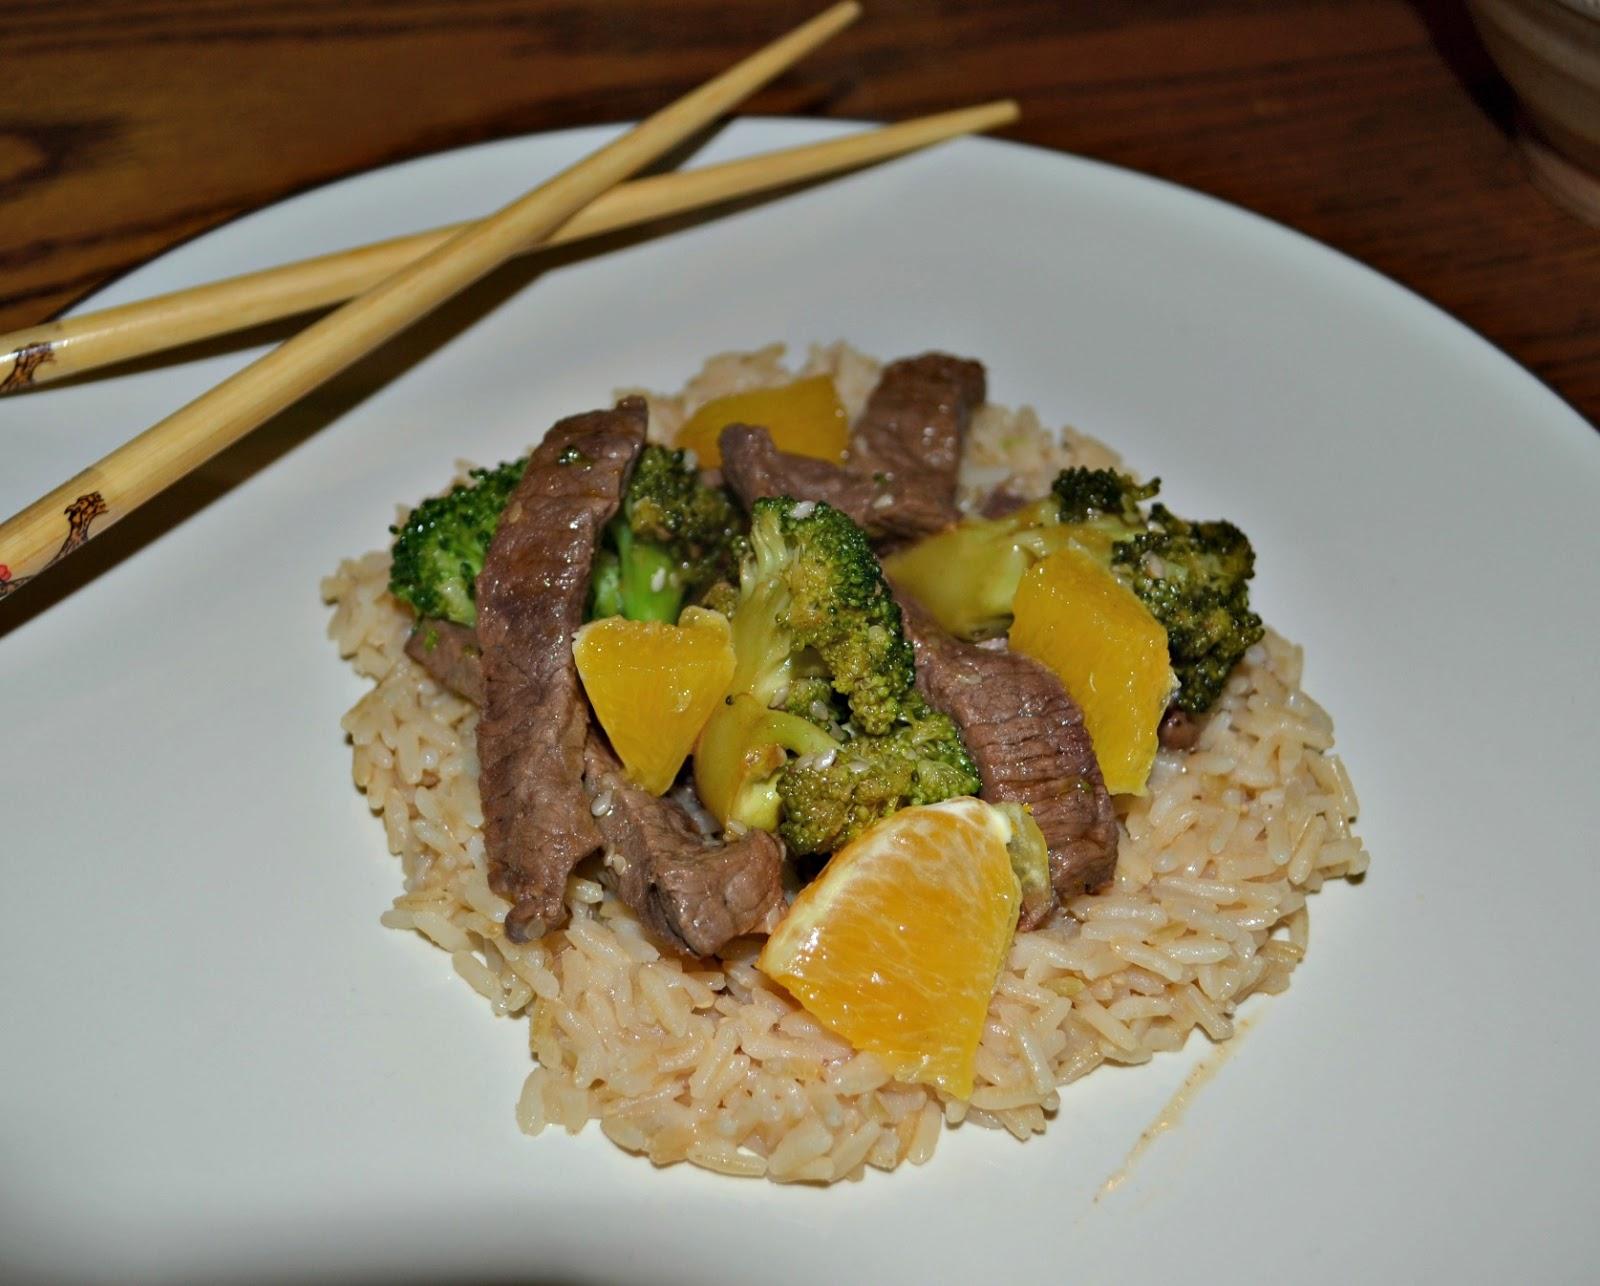 tofu stir fry broccoli tofu stir fry with brown rice orange beef style ...